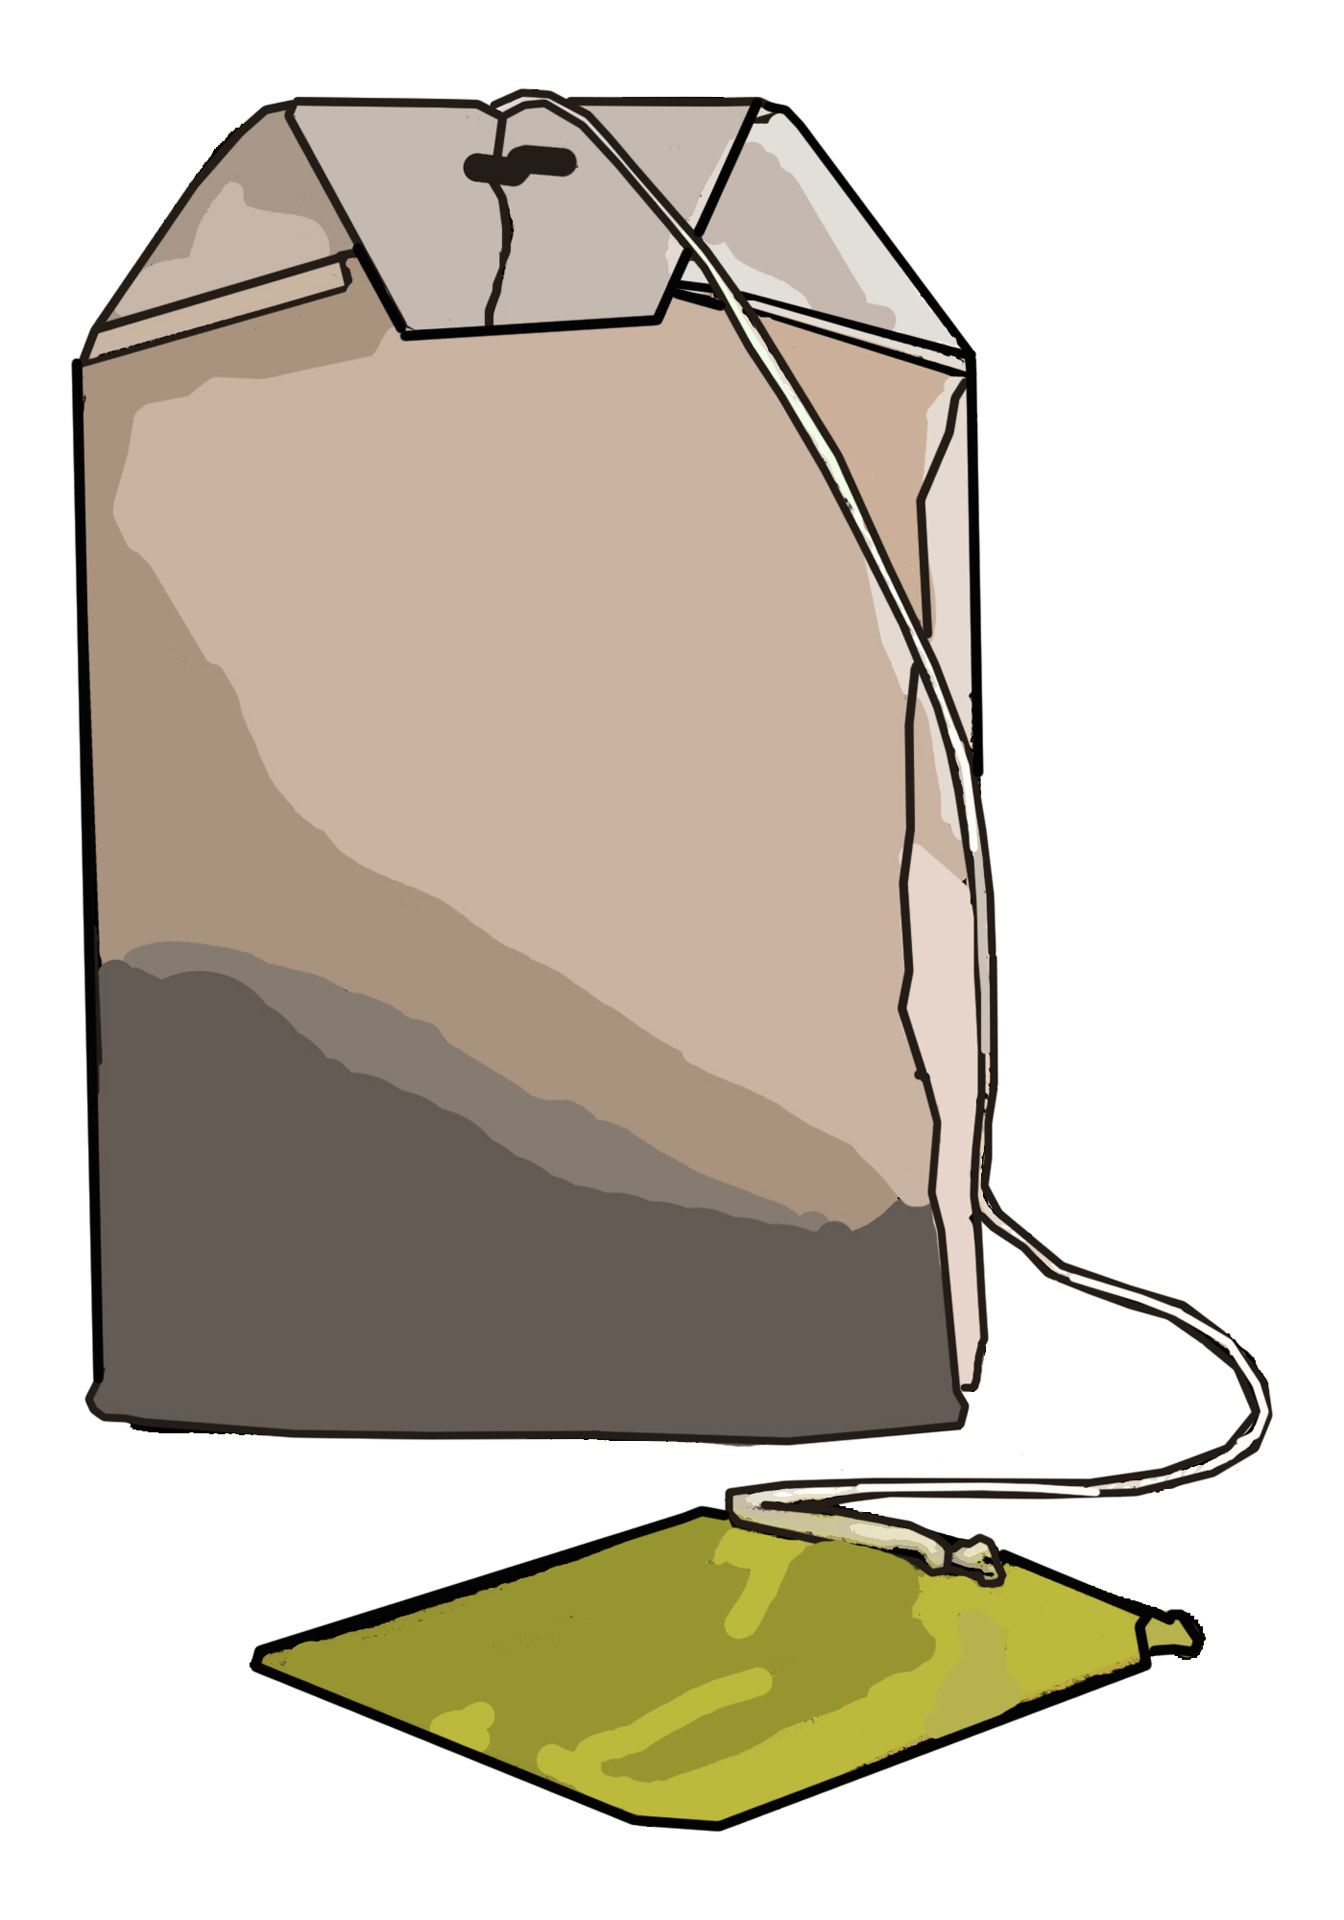 Tea Bag Clip Art Free Stock Photo.